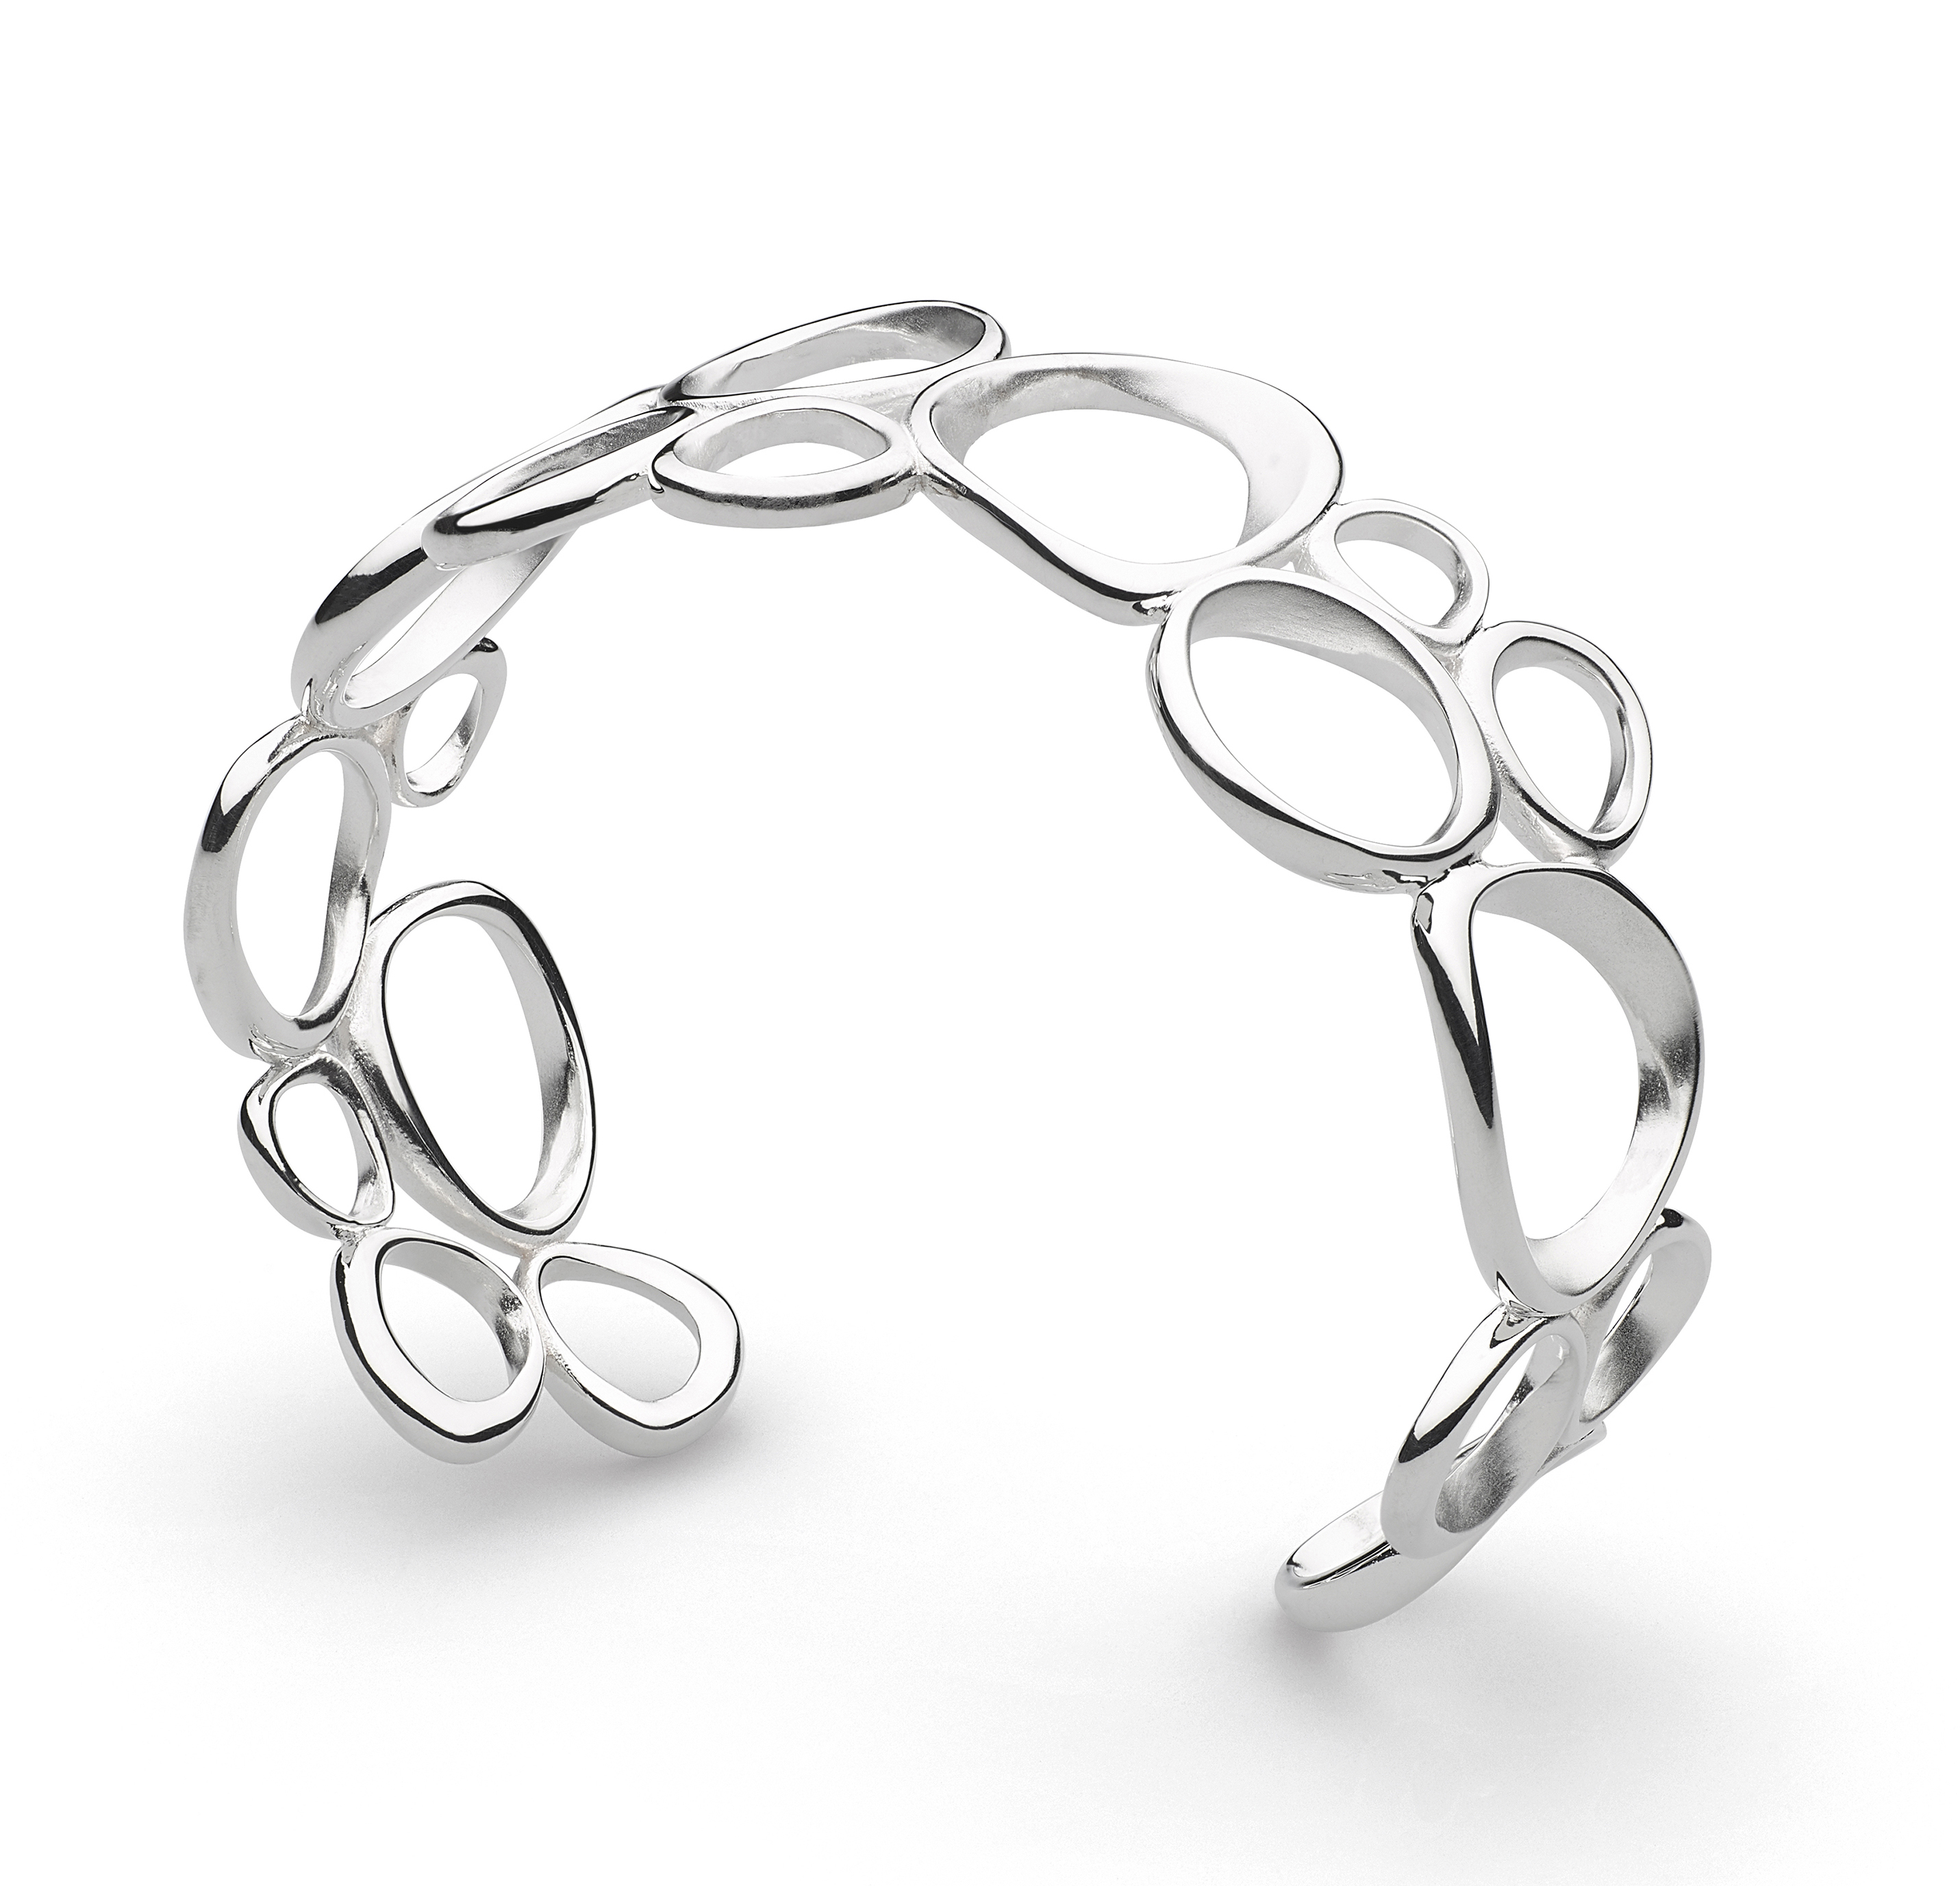 Sterling silver organic circles cuff bangle